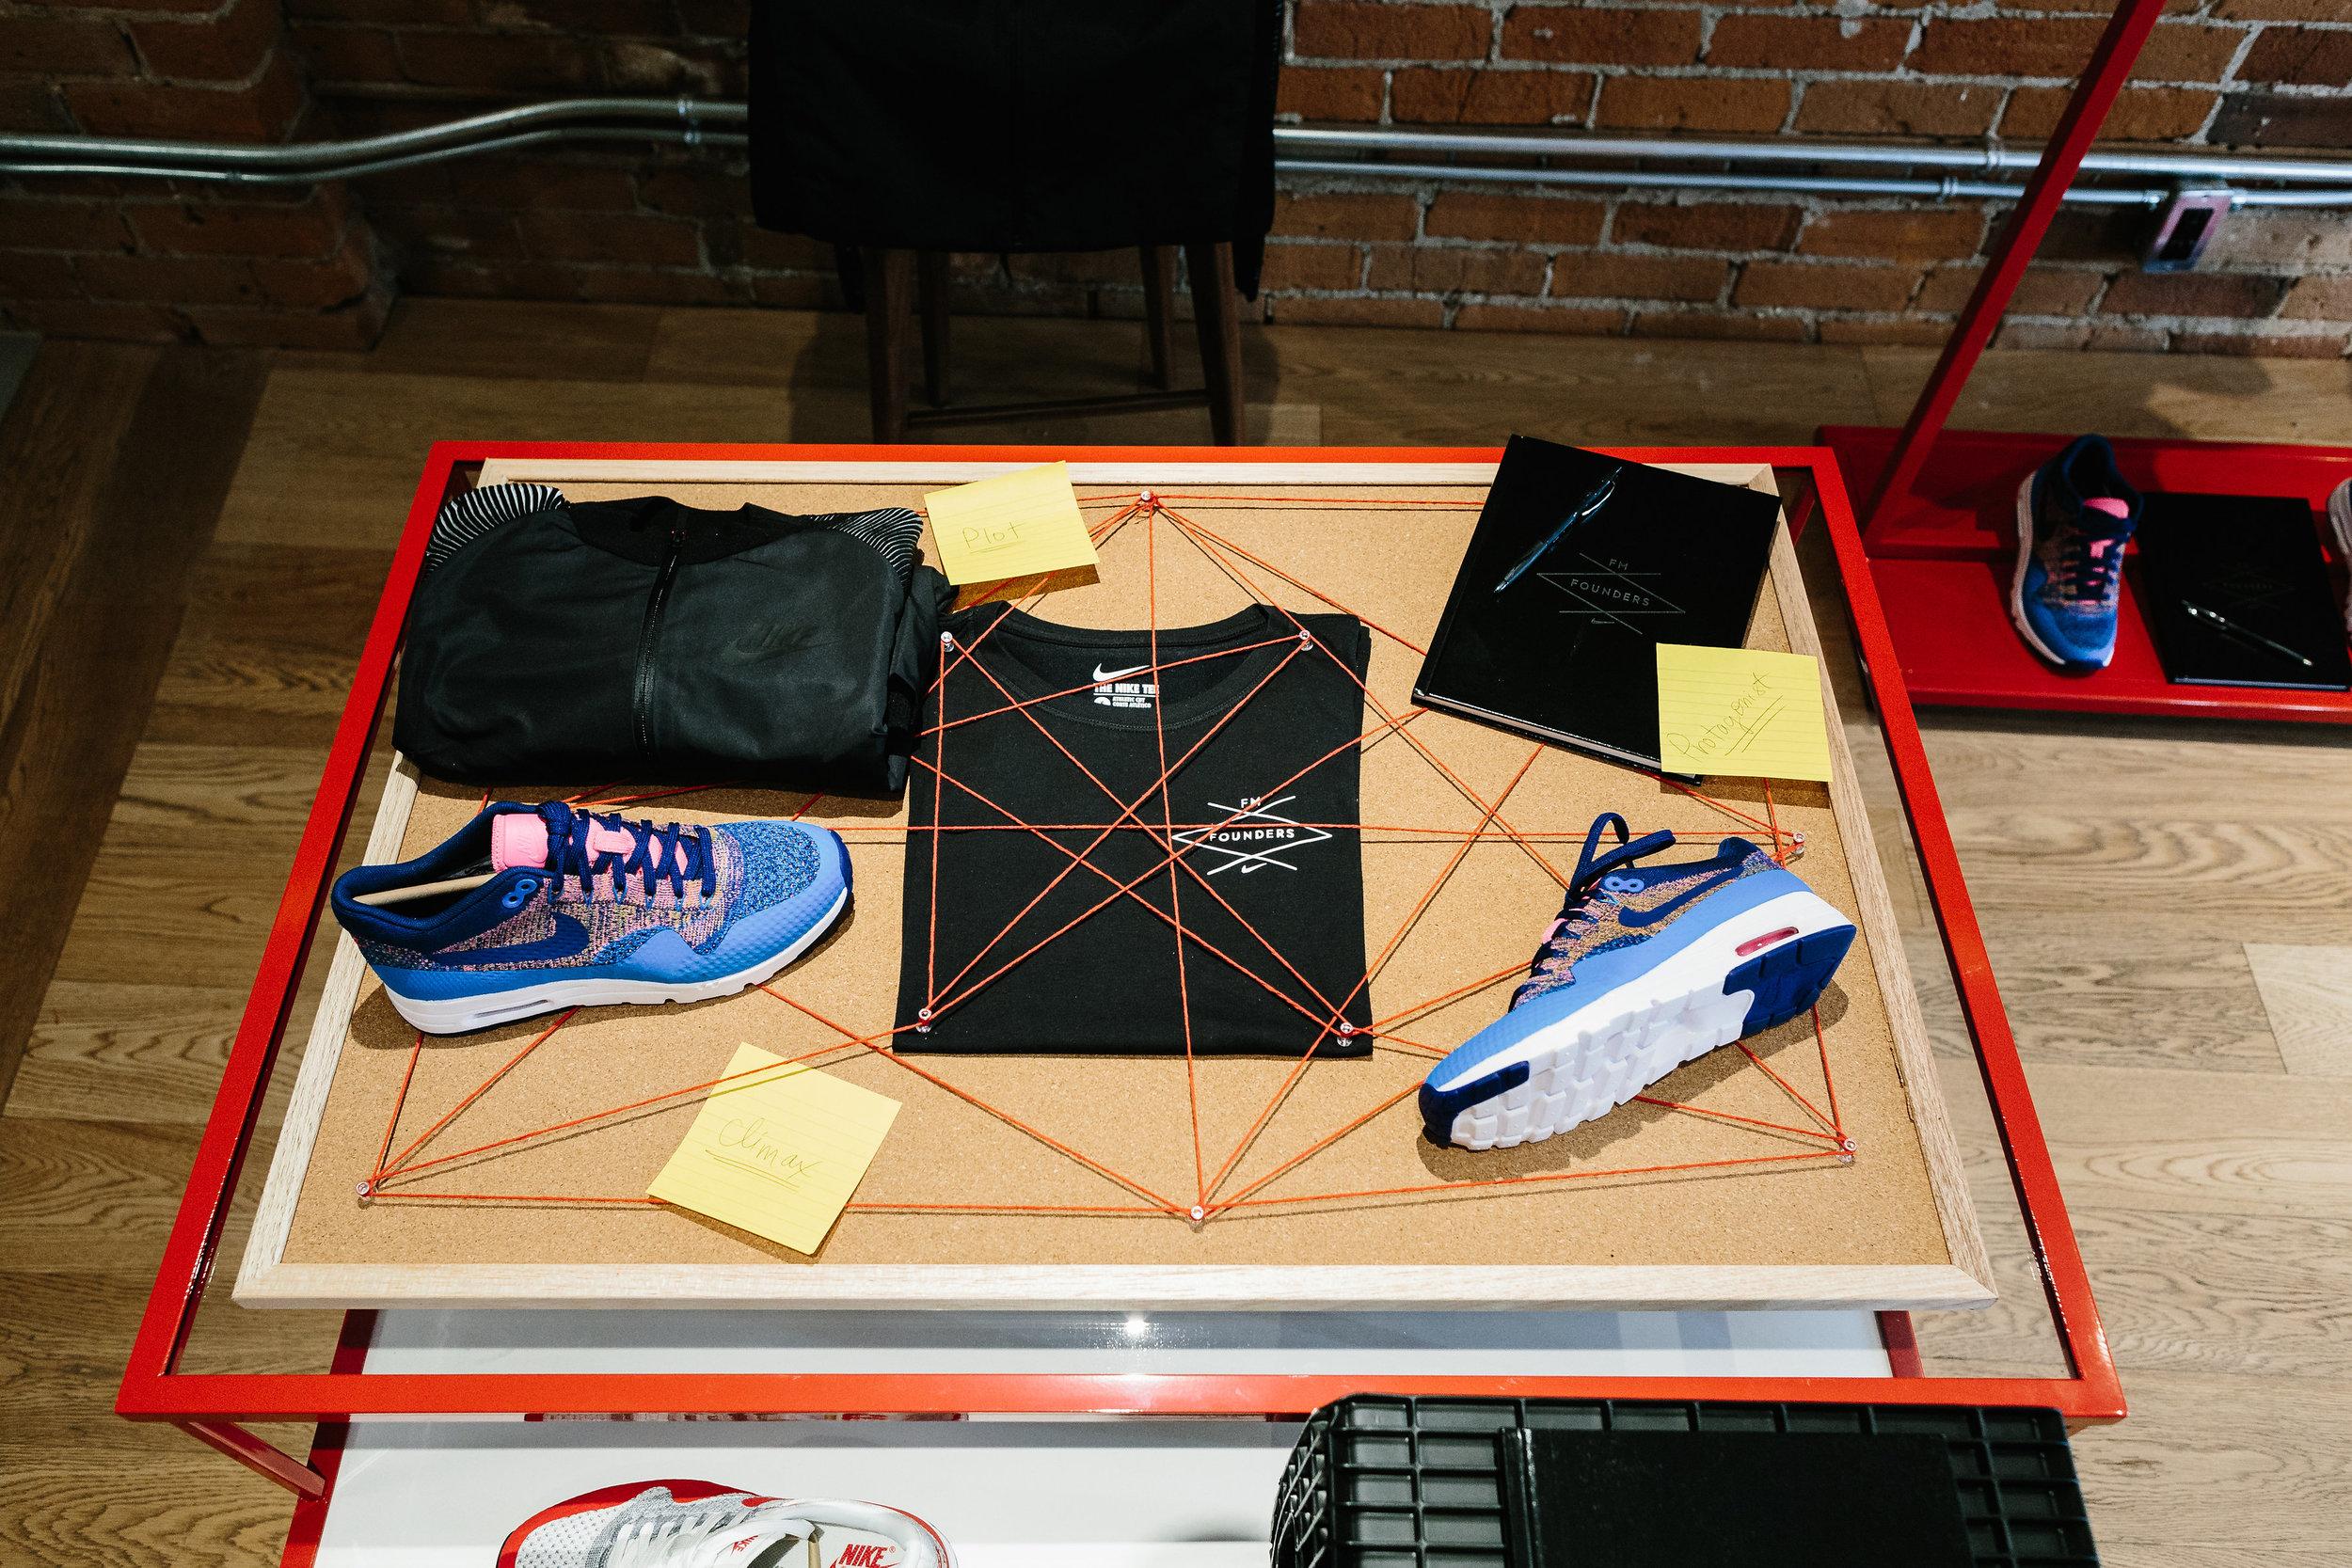 Nike-Air-Max-Toronto-FM-Founders-FoundMissing